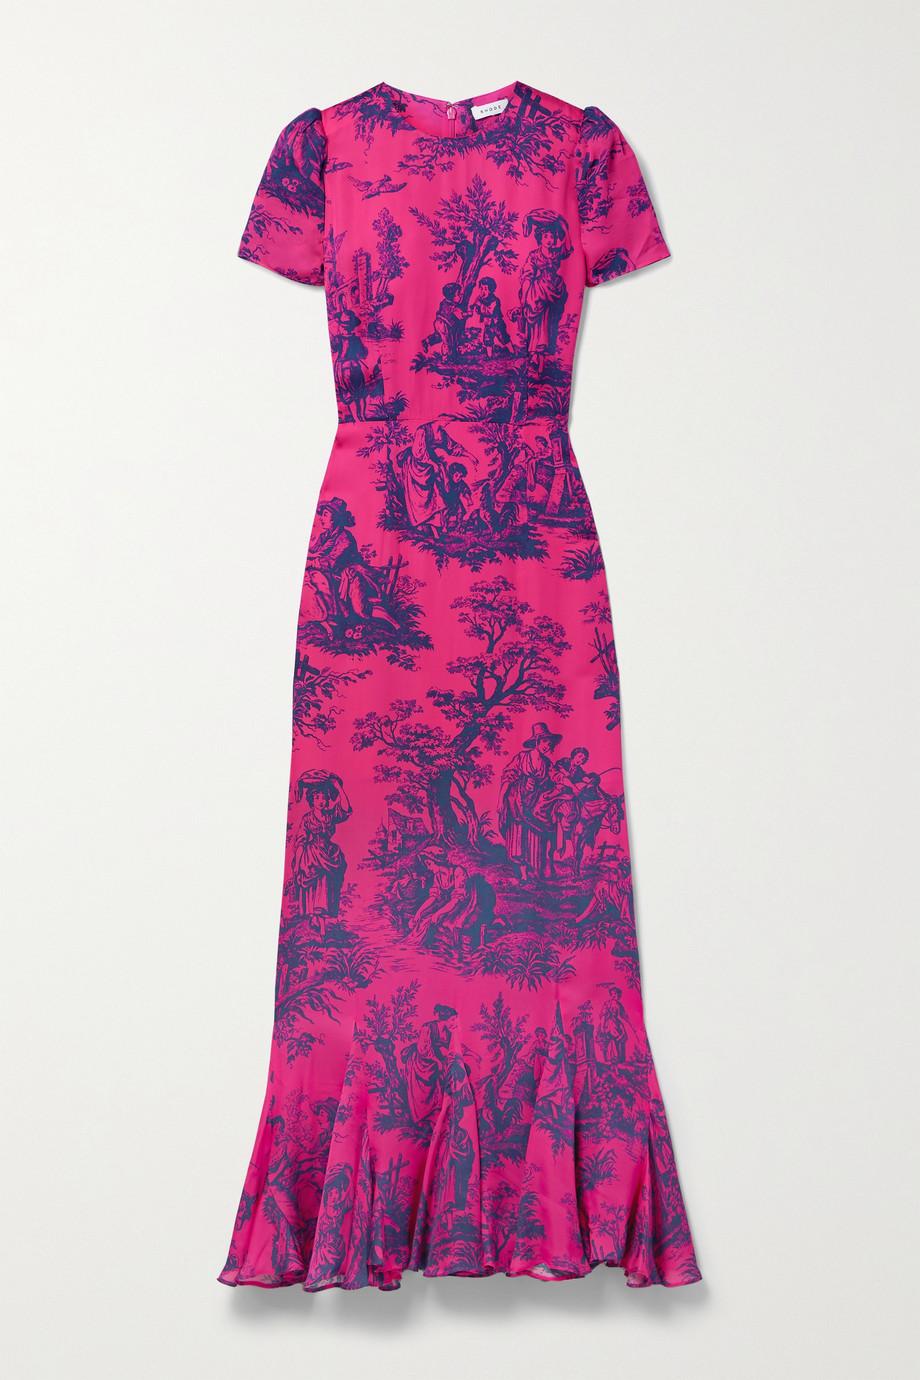 Rhode Lulani printed crepe dress